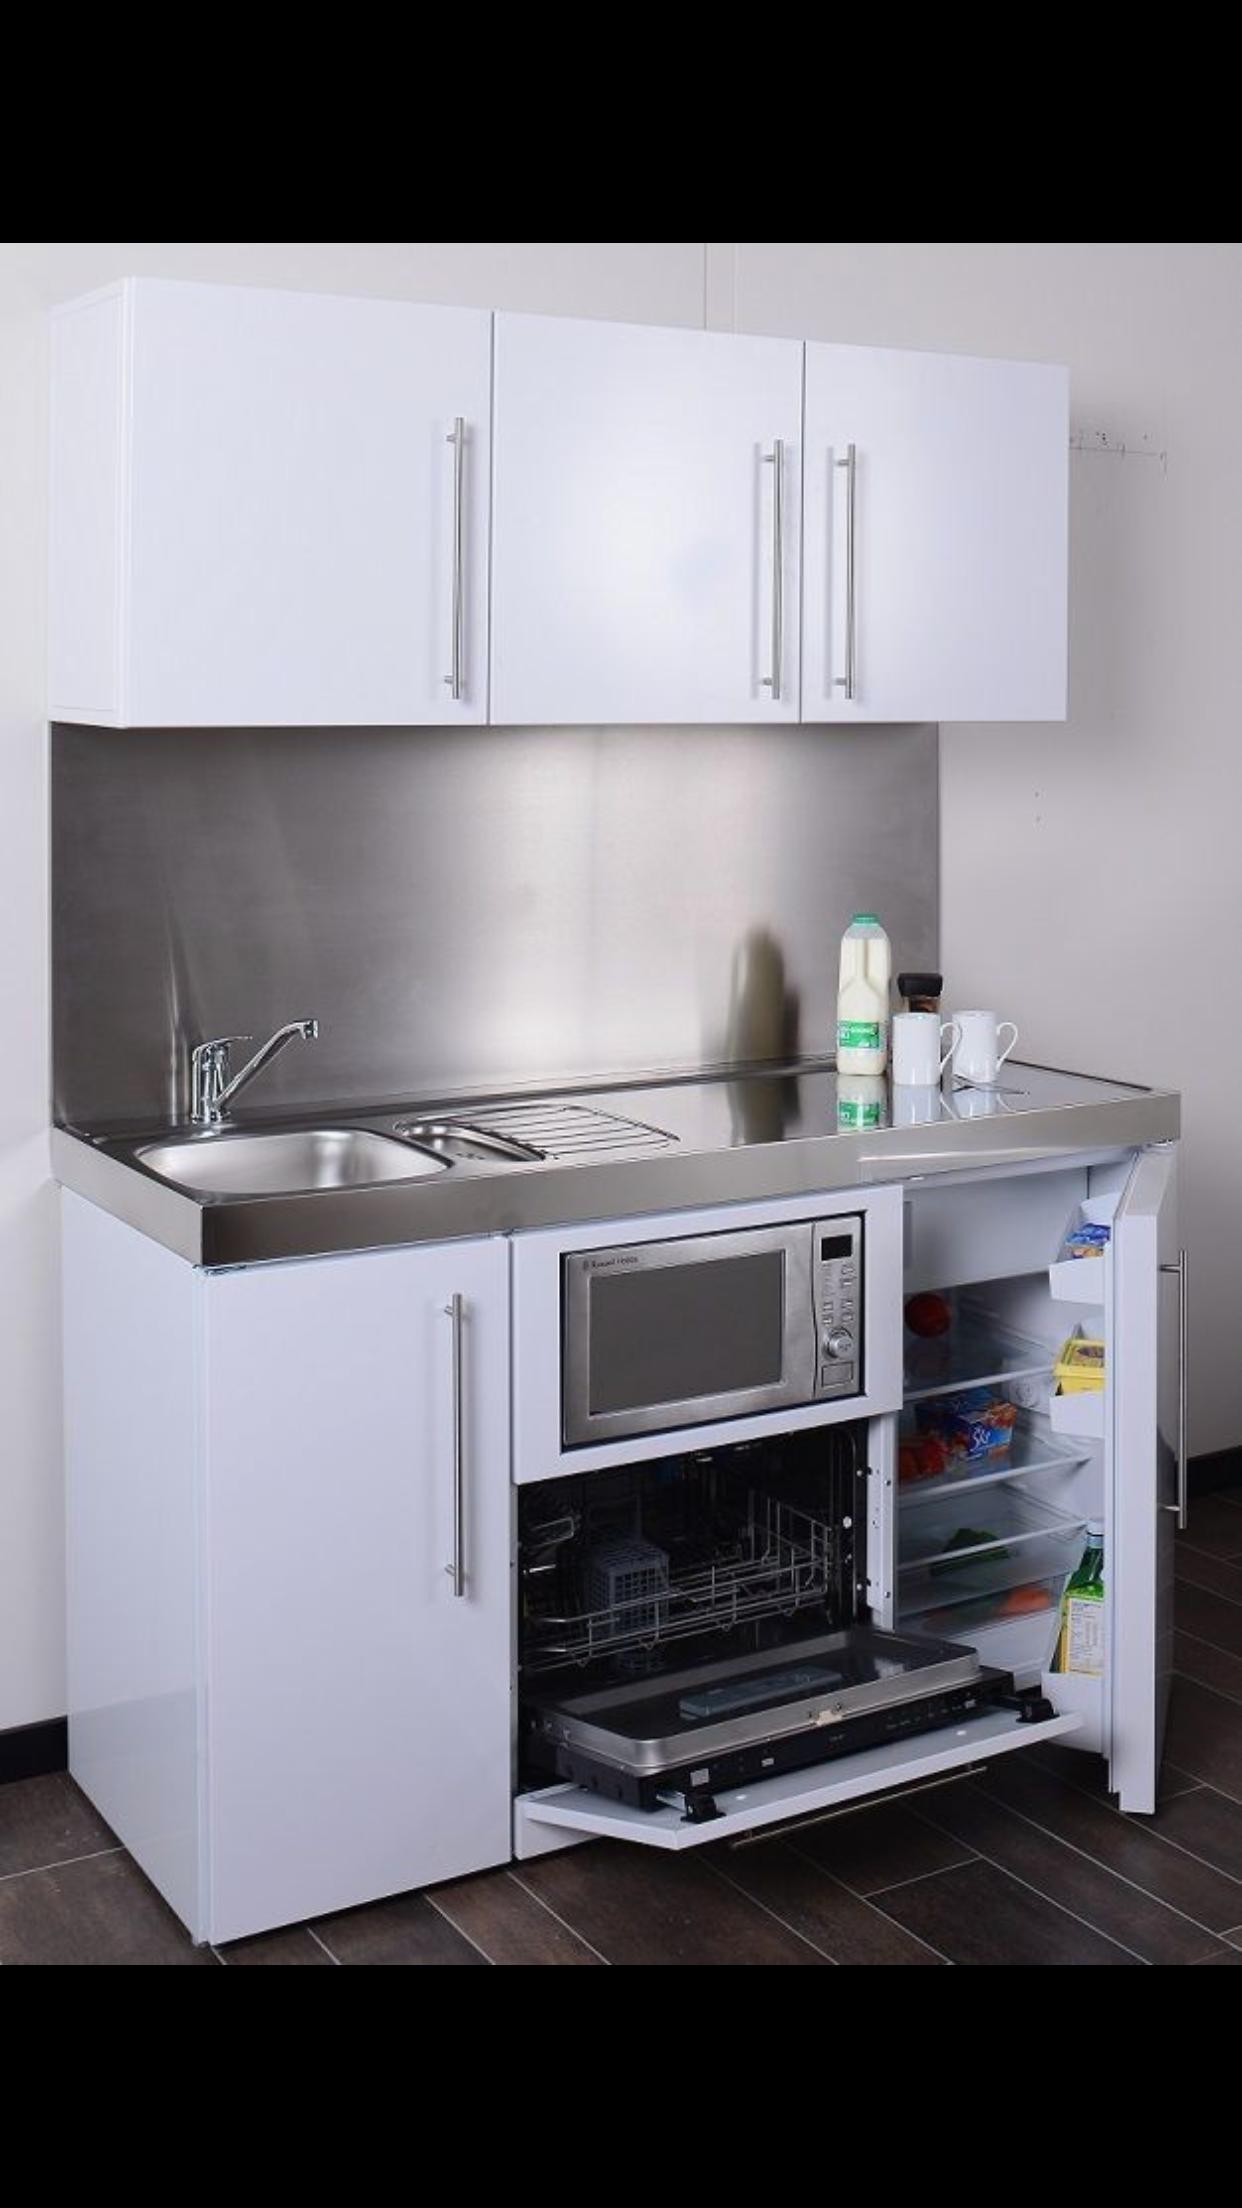 Pin By Leti On Kitchen Small Apartment Kitchen Interior Design